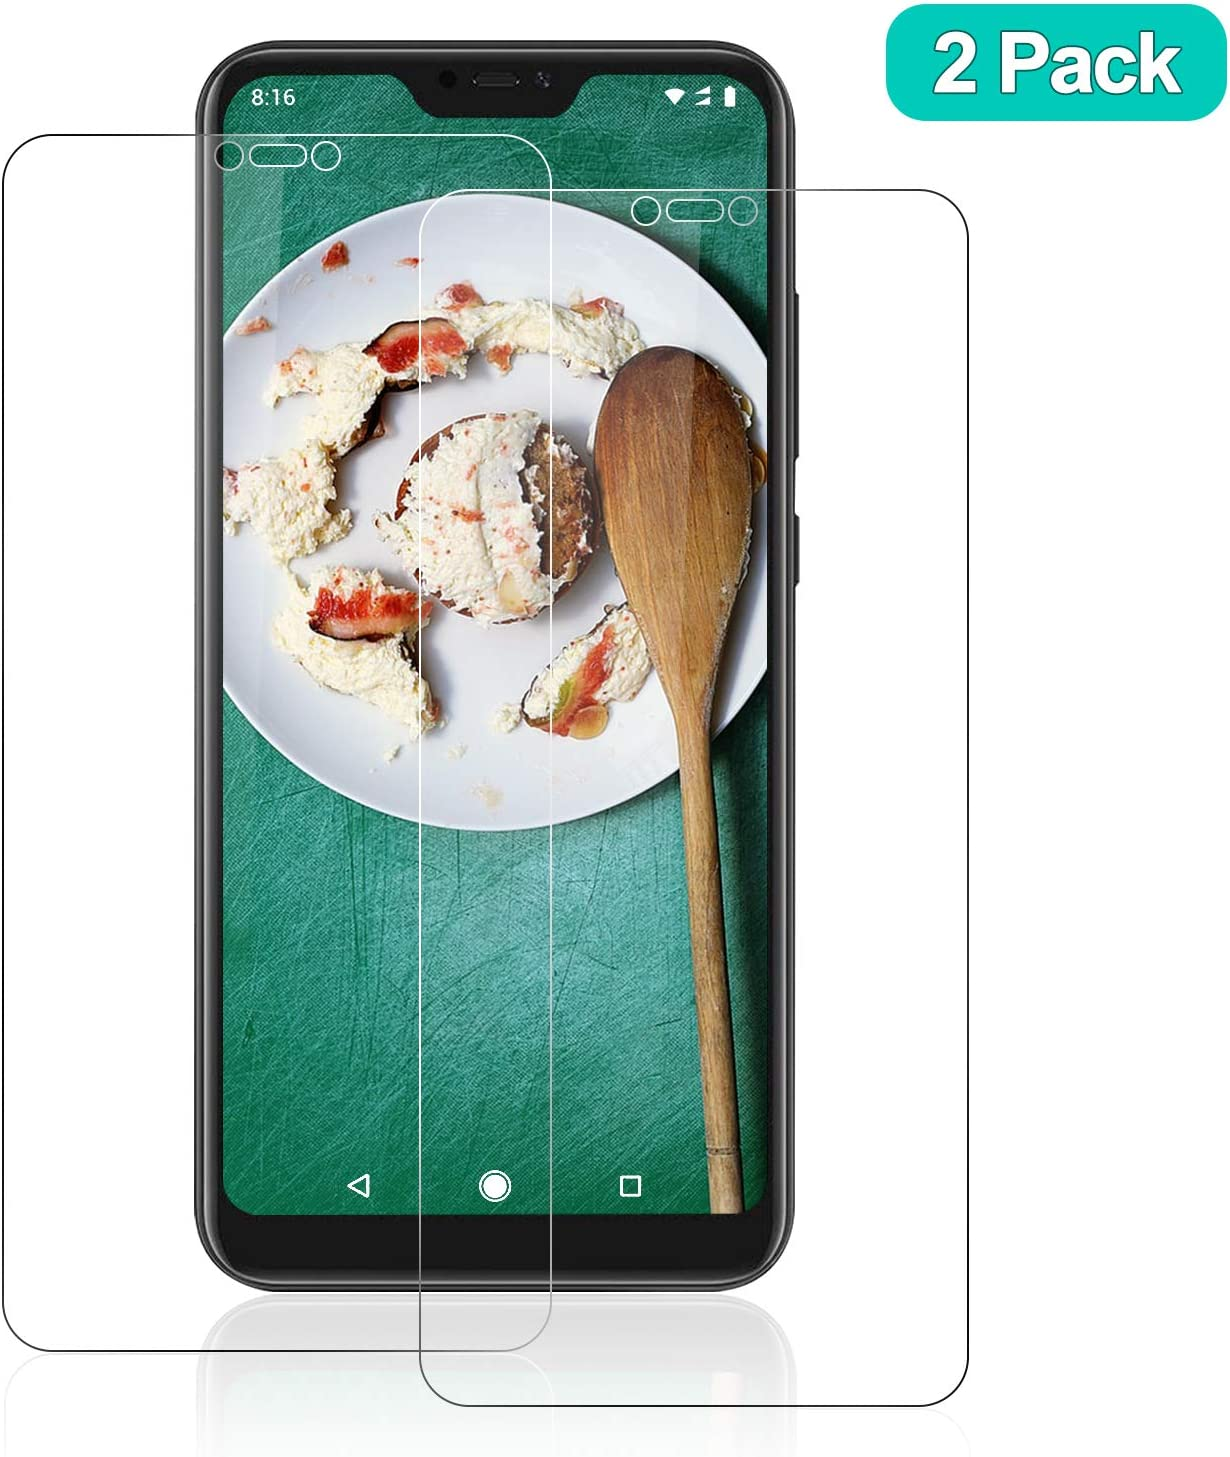 SNUNGPHIR® Protector Pantalla para Xiaomi Mi A2 Lite Cristal Templado Protector de Pantalla HD Clear 9H Dureza Anti-Rasguños Anti-Huellas Dactilares Libre de Burbujas 3D Touch (2 Piezas)